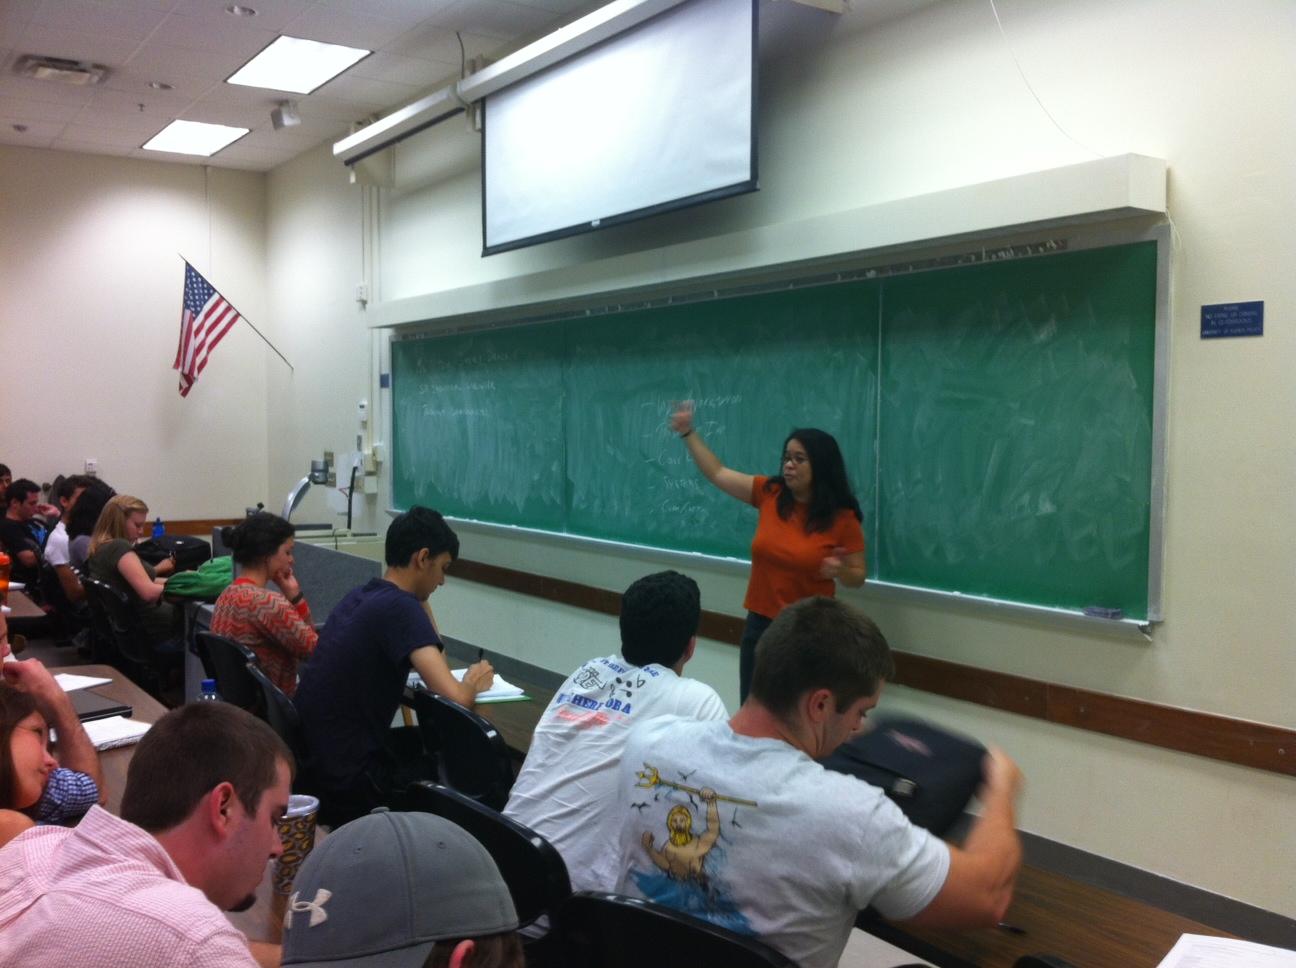 Natzia Jimenez-Drack delivers a lecture to students